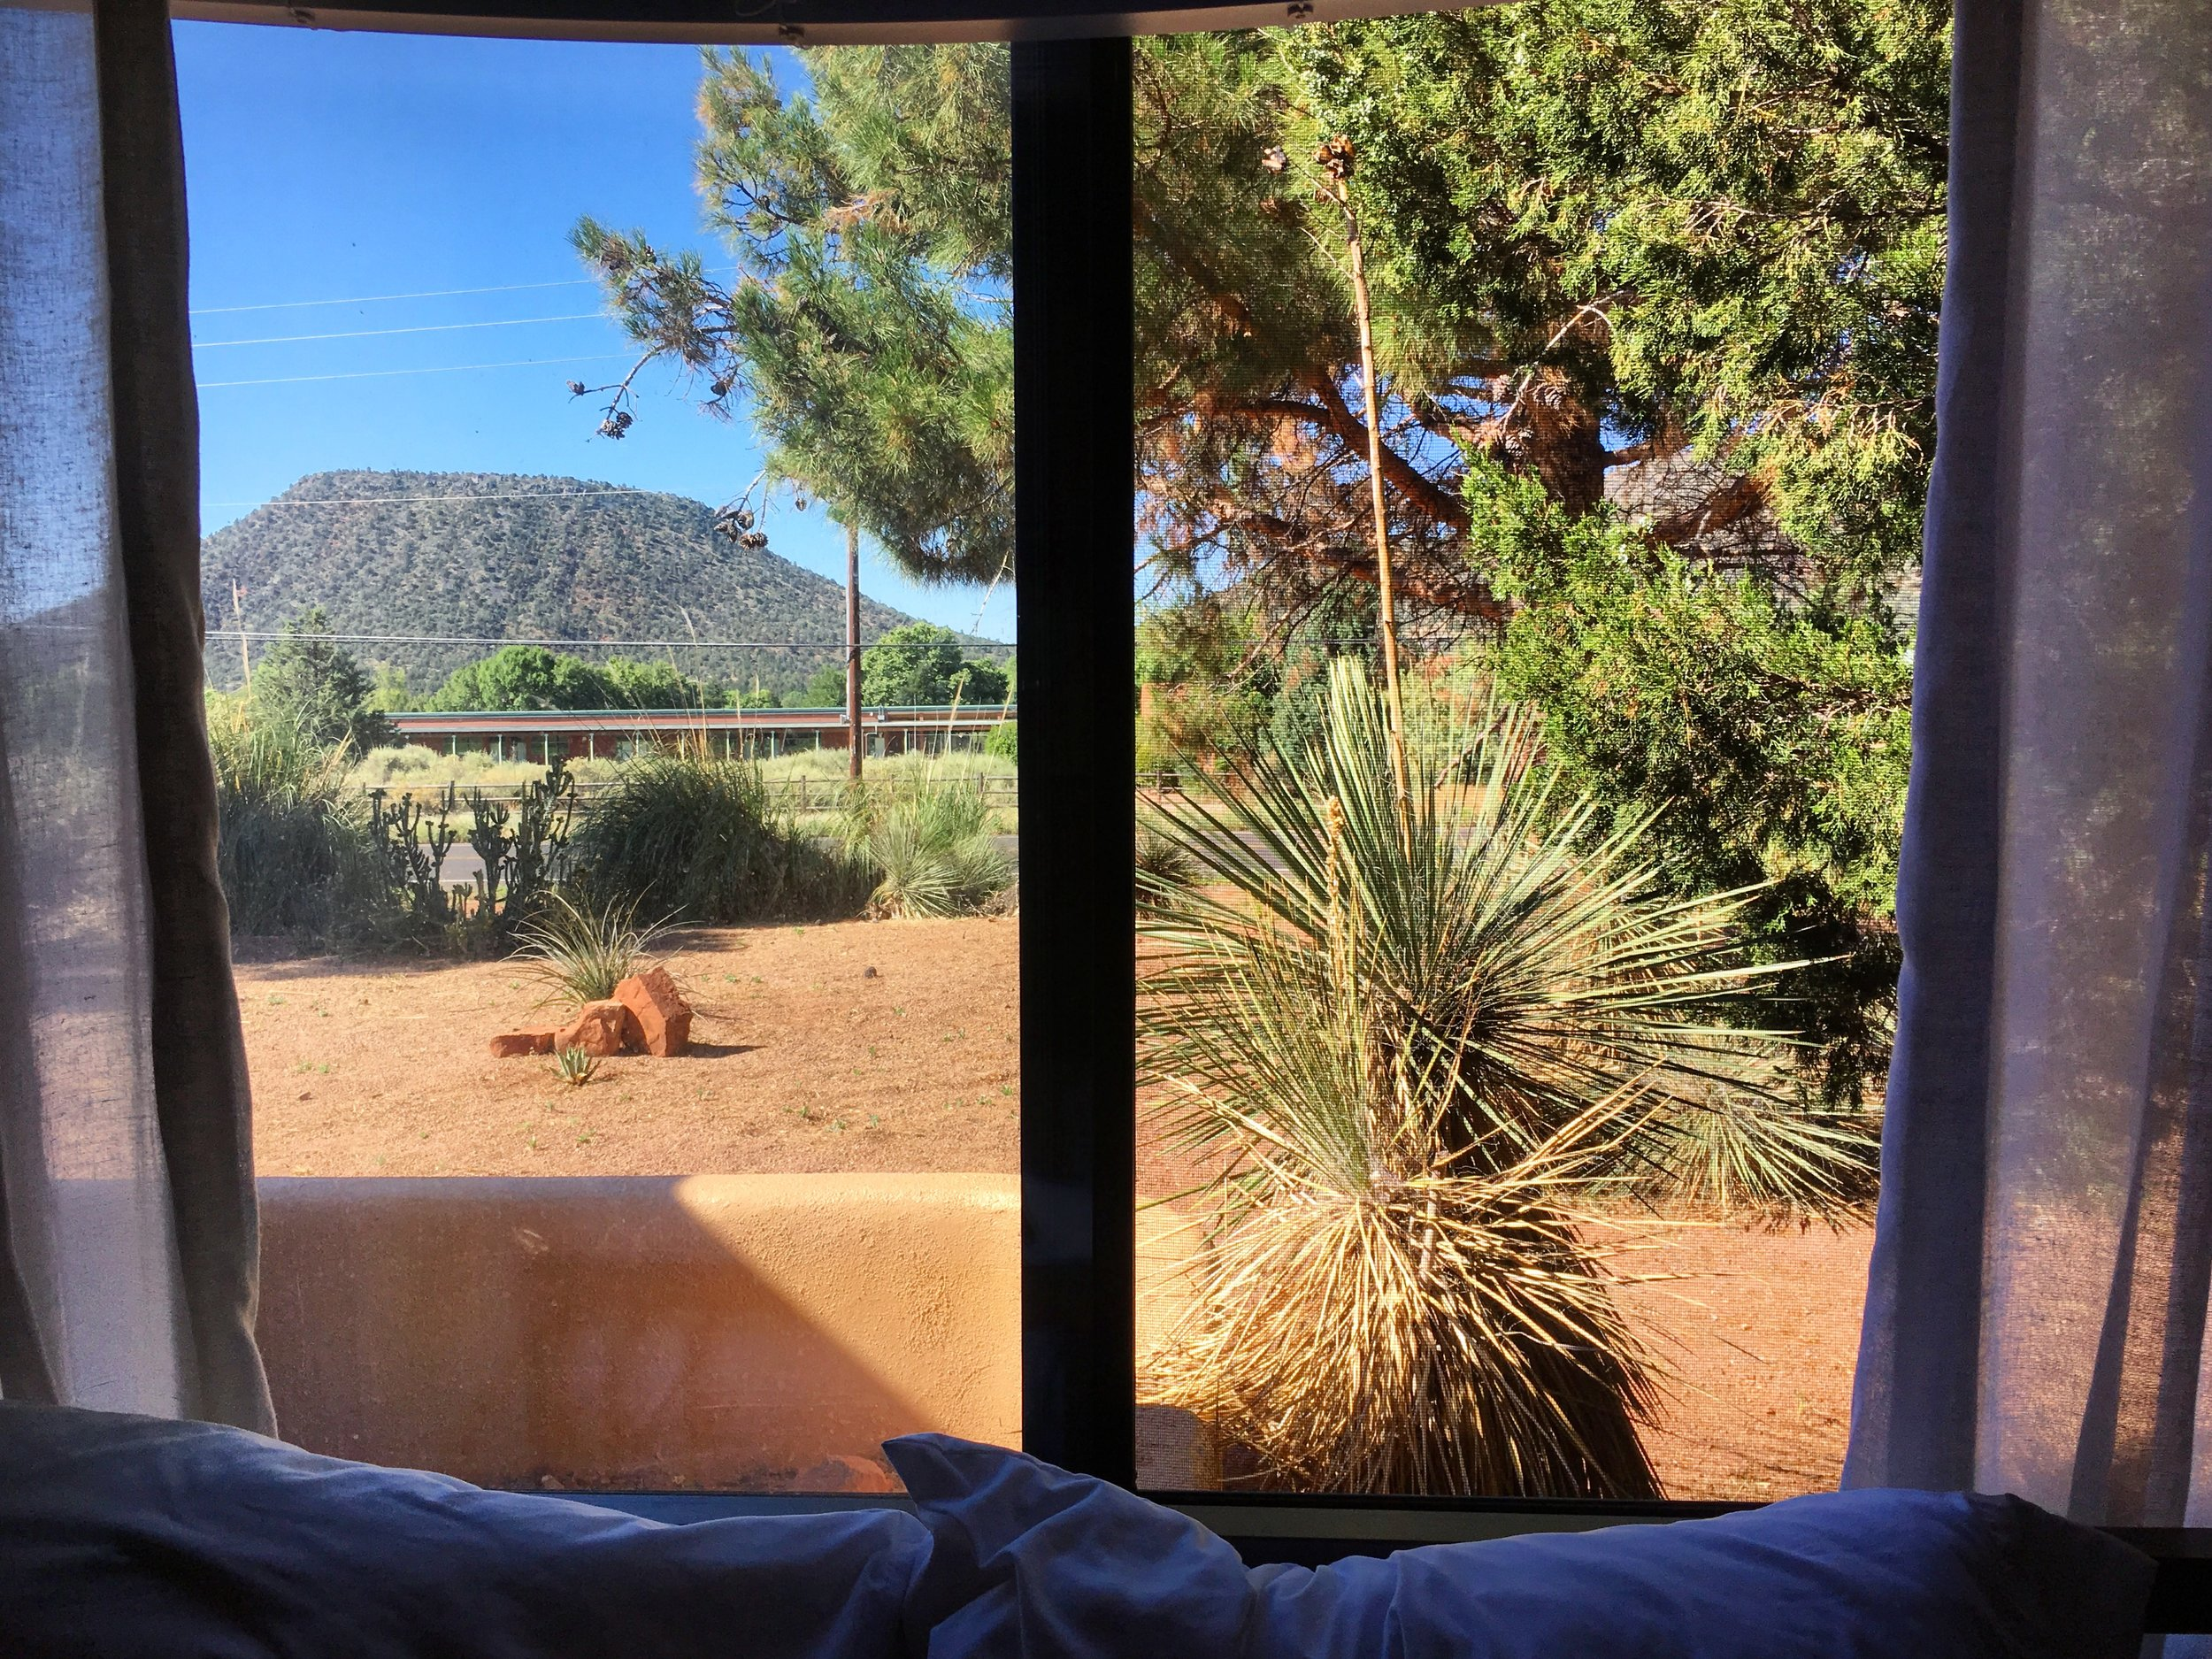 One last Airbnb in Sedona.